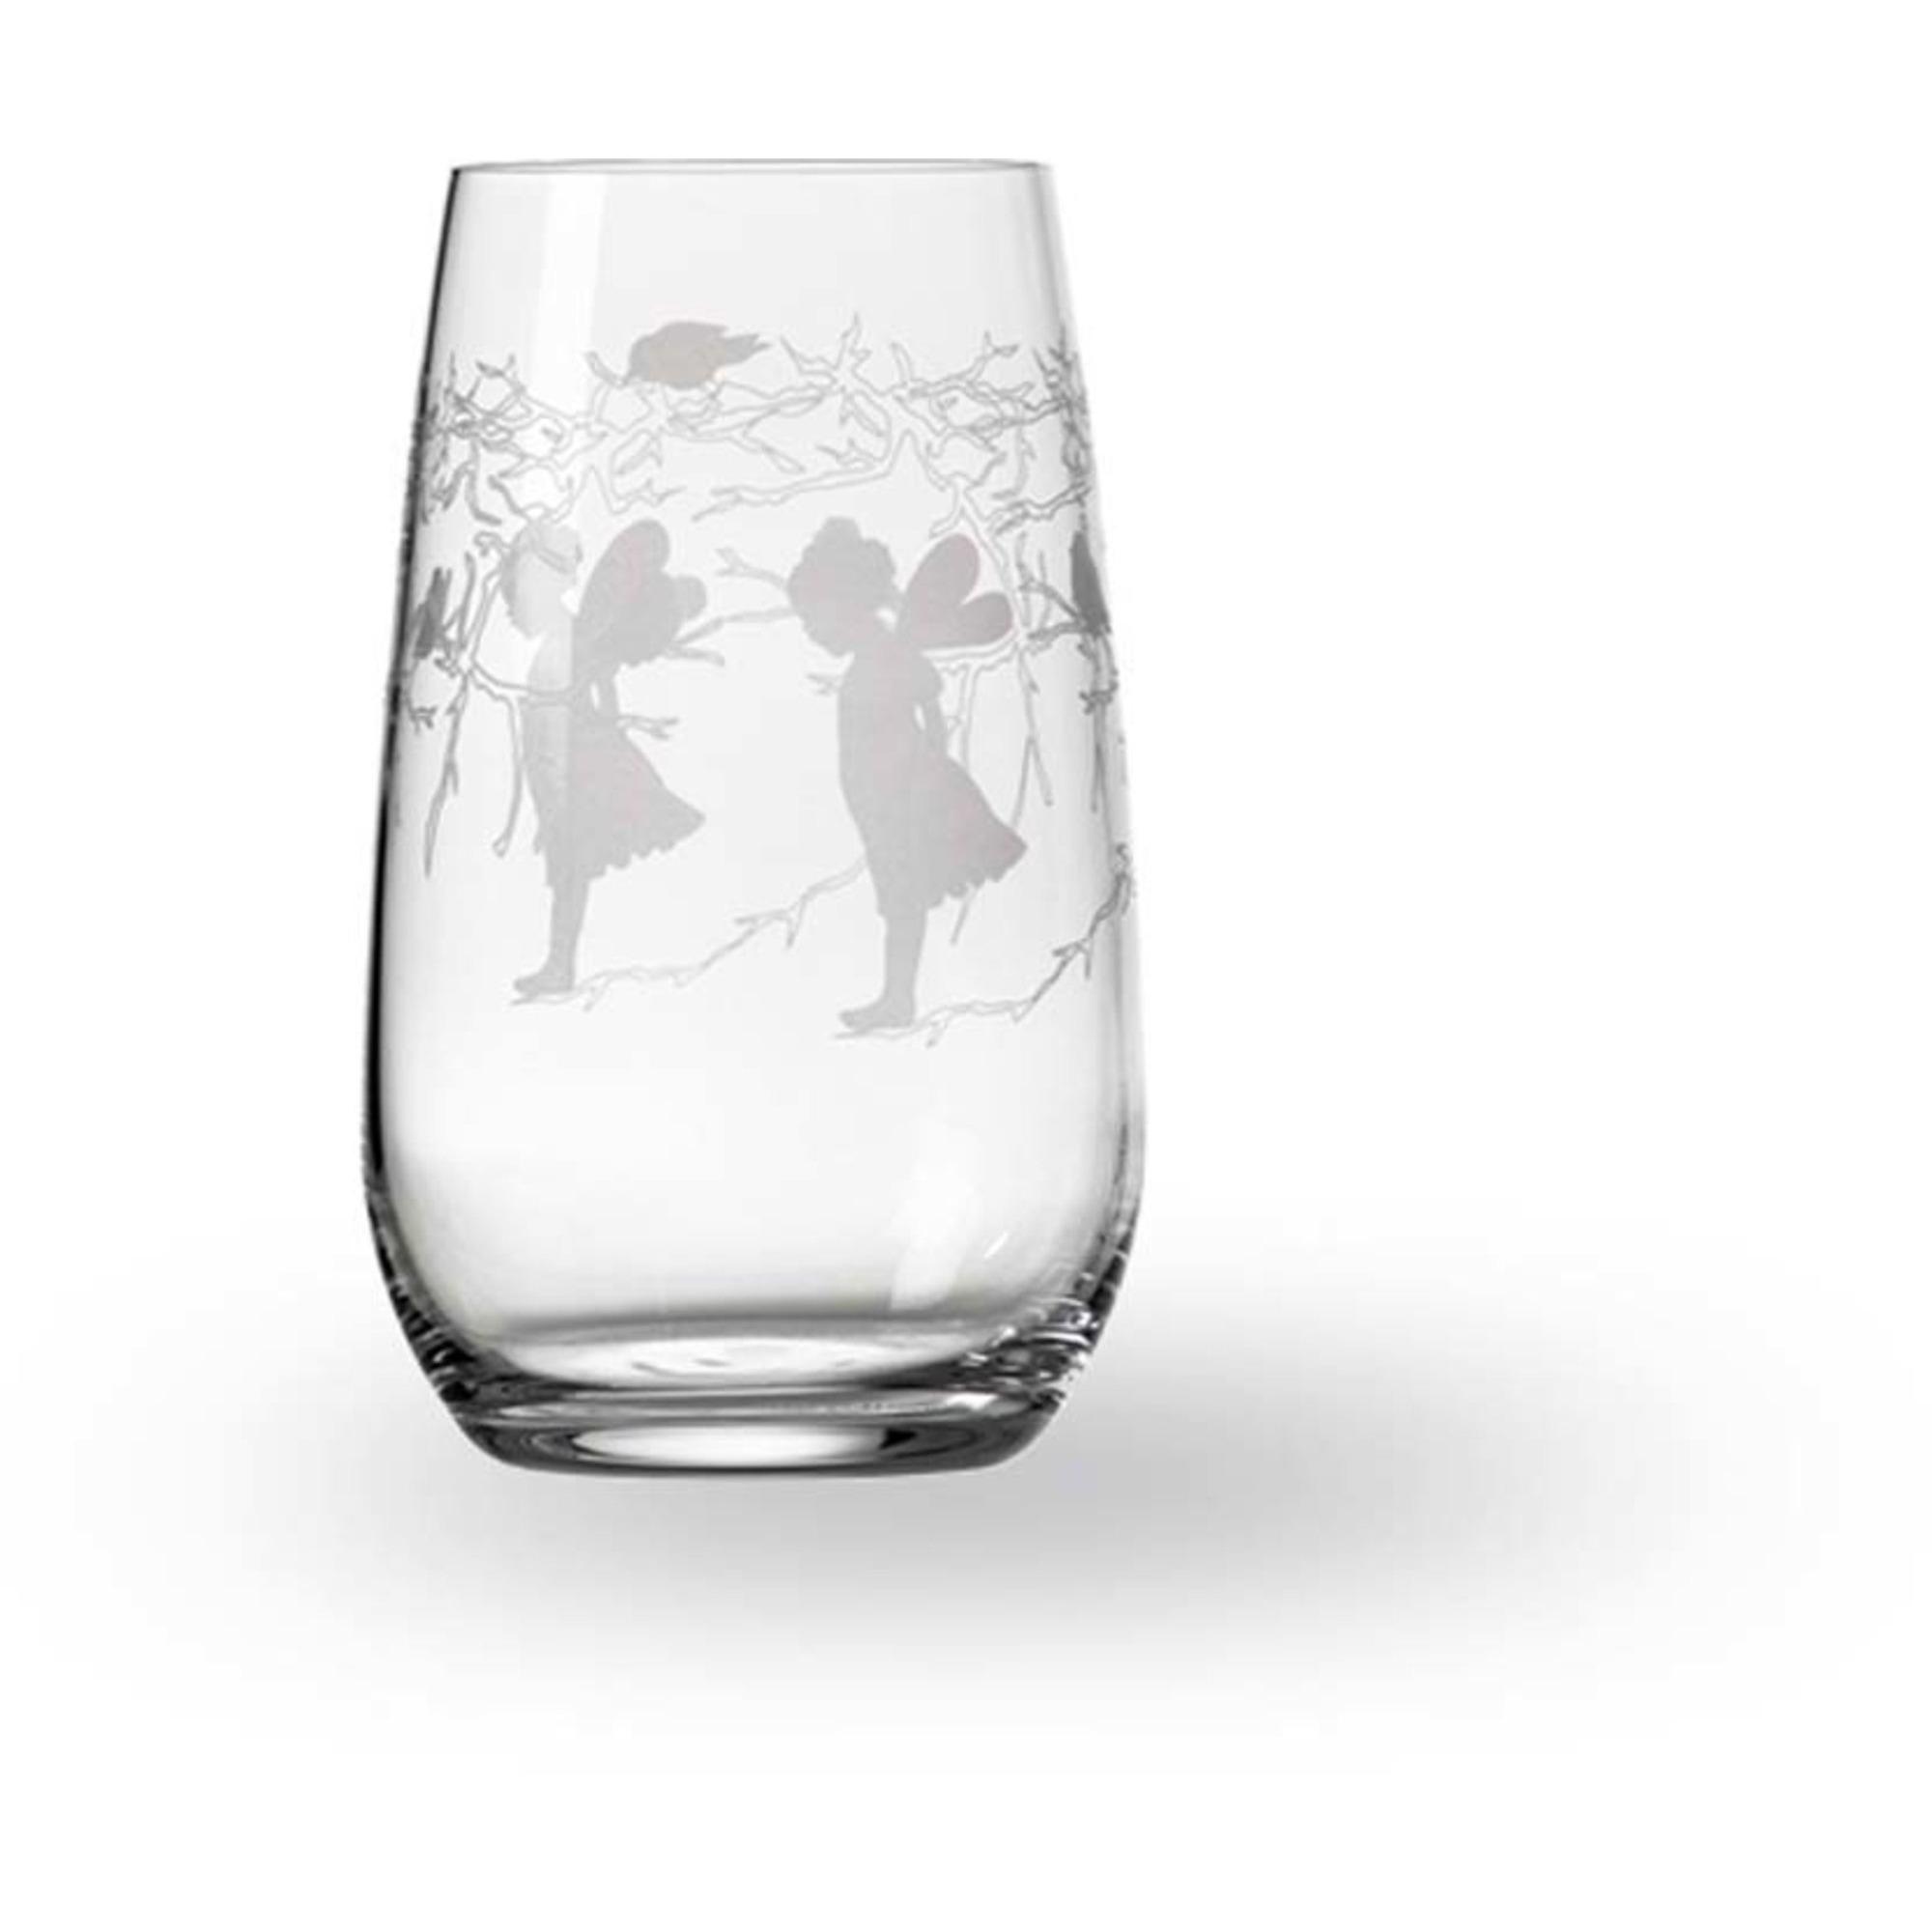 Wik & Walsøe Alv Ölglas 48 cl